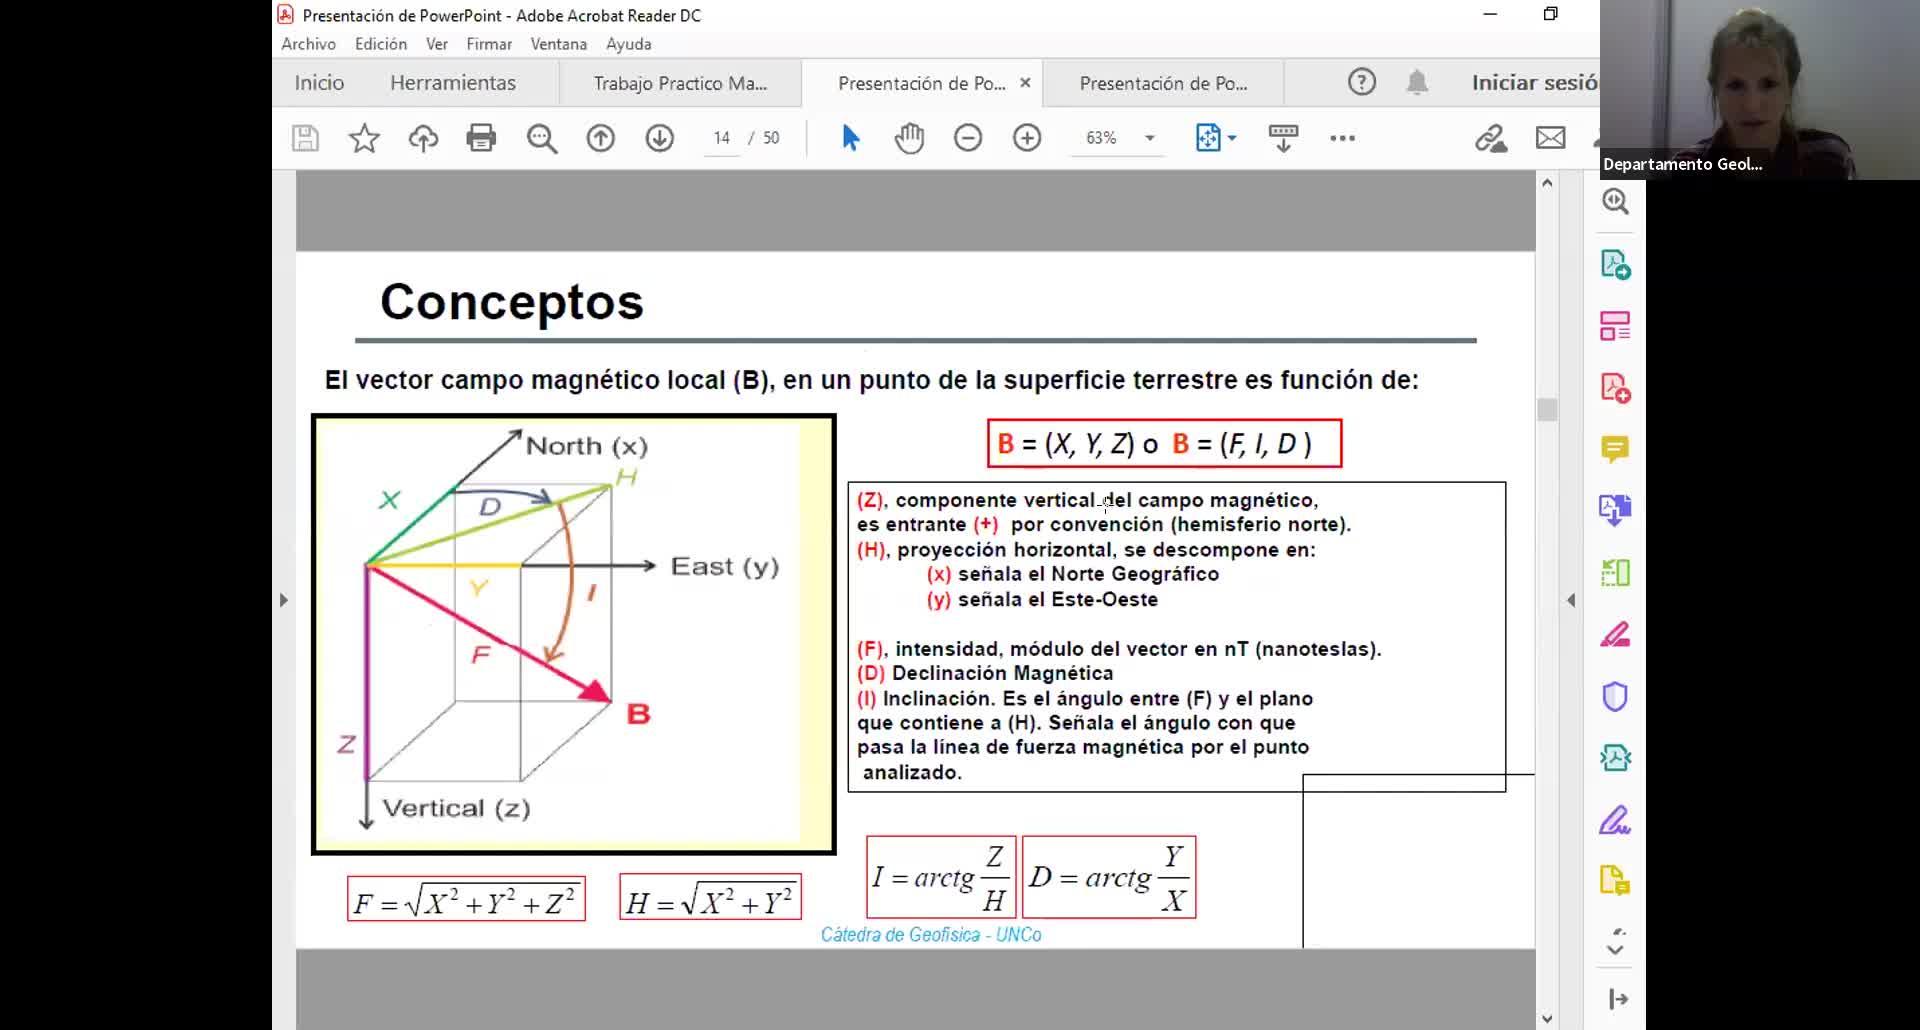 Geofísica - clase virtual - 09-09-2020